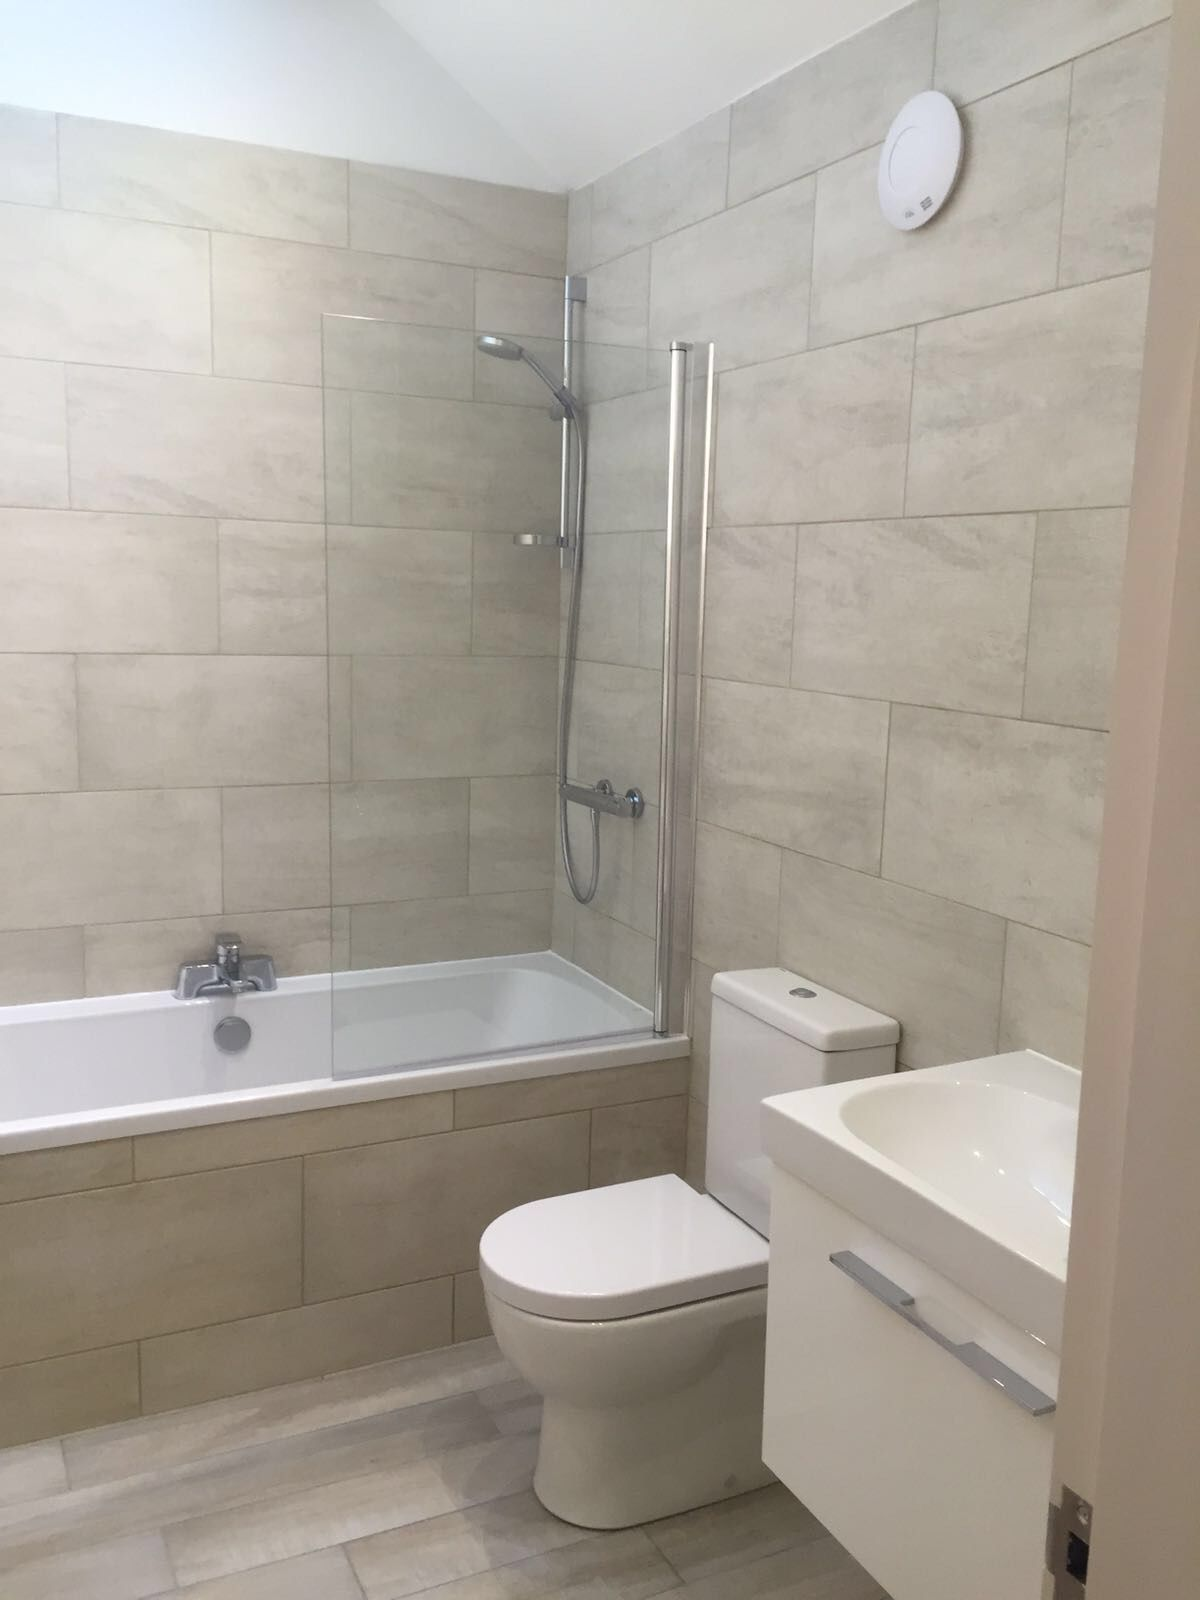 Pin Lis 228 228 J 228 Lt 228 Katriina Peltomaa Taulussa Bathrooms 2 2019